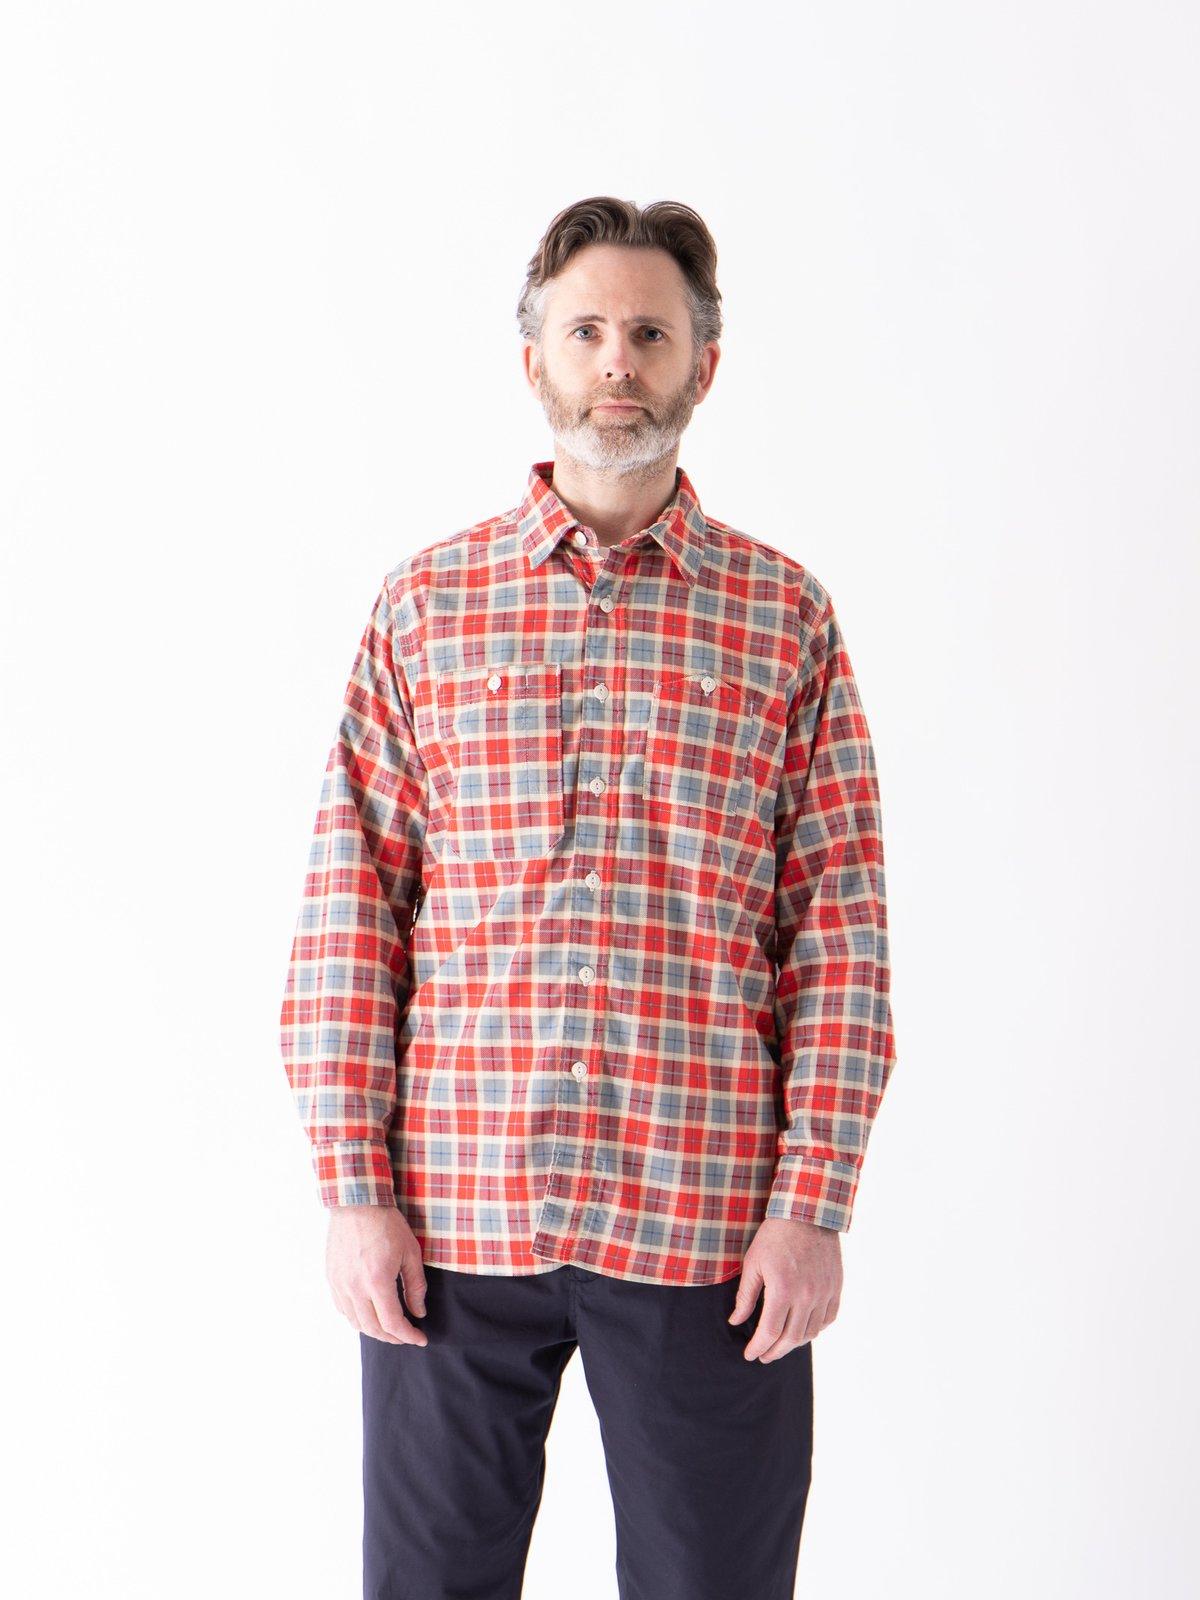 Red/Beige Cotton Printed Plaid Work Shirt - Image 2